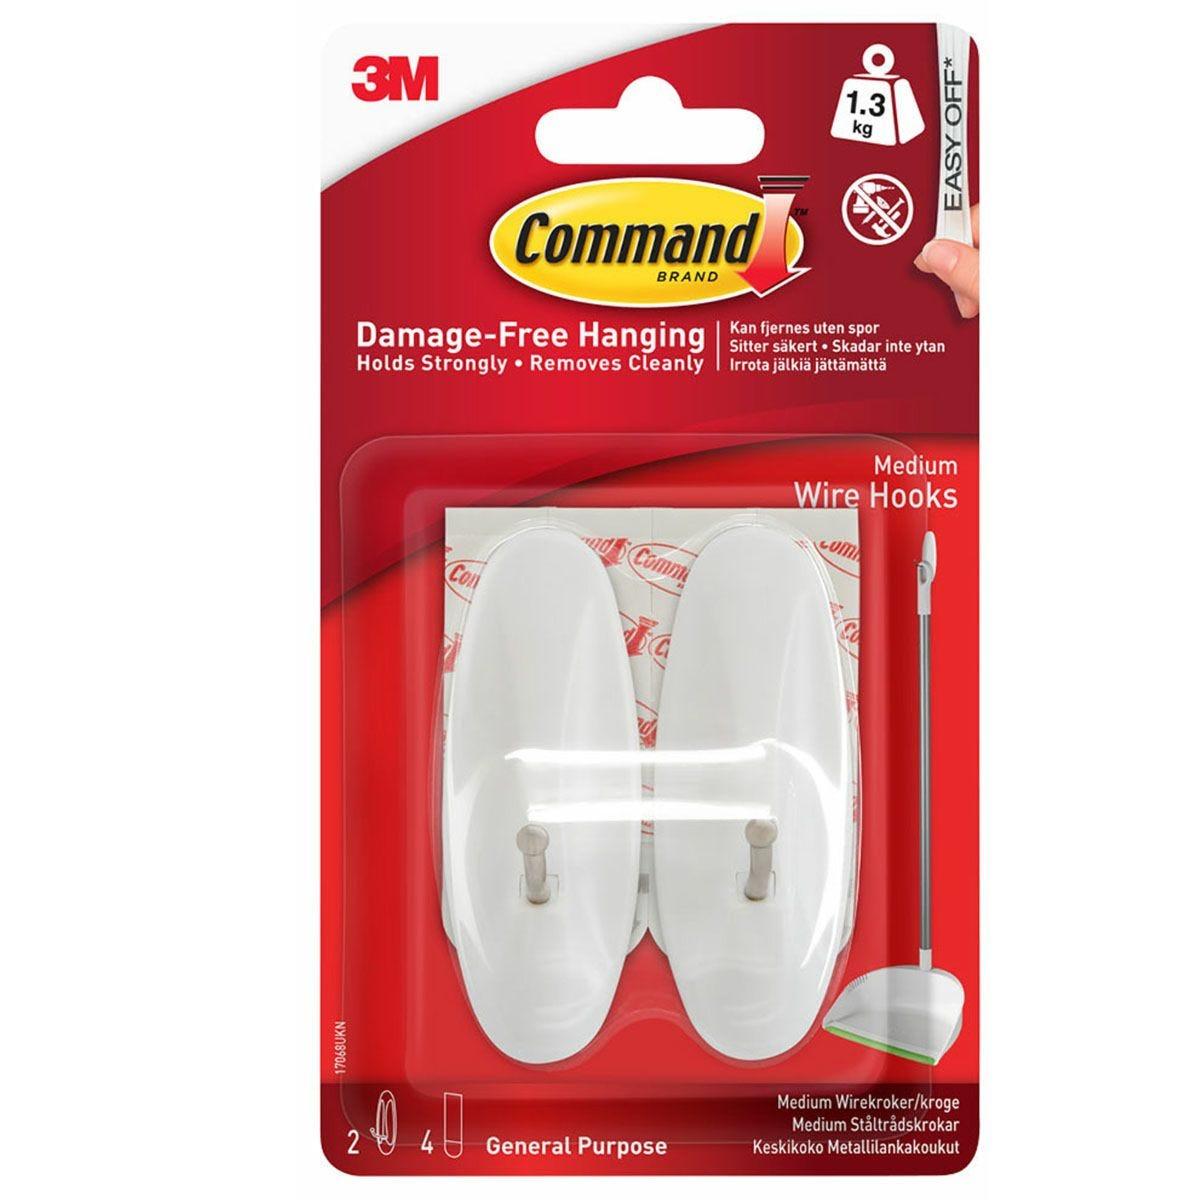 3M Command Medium White Wire Hooks - 2 Pack